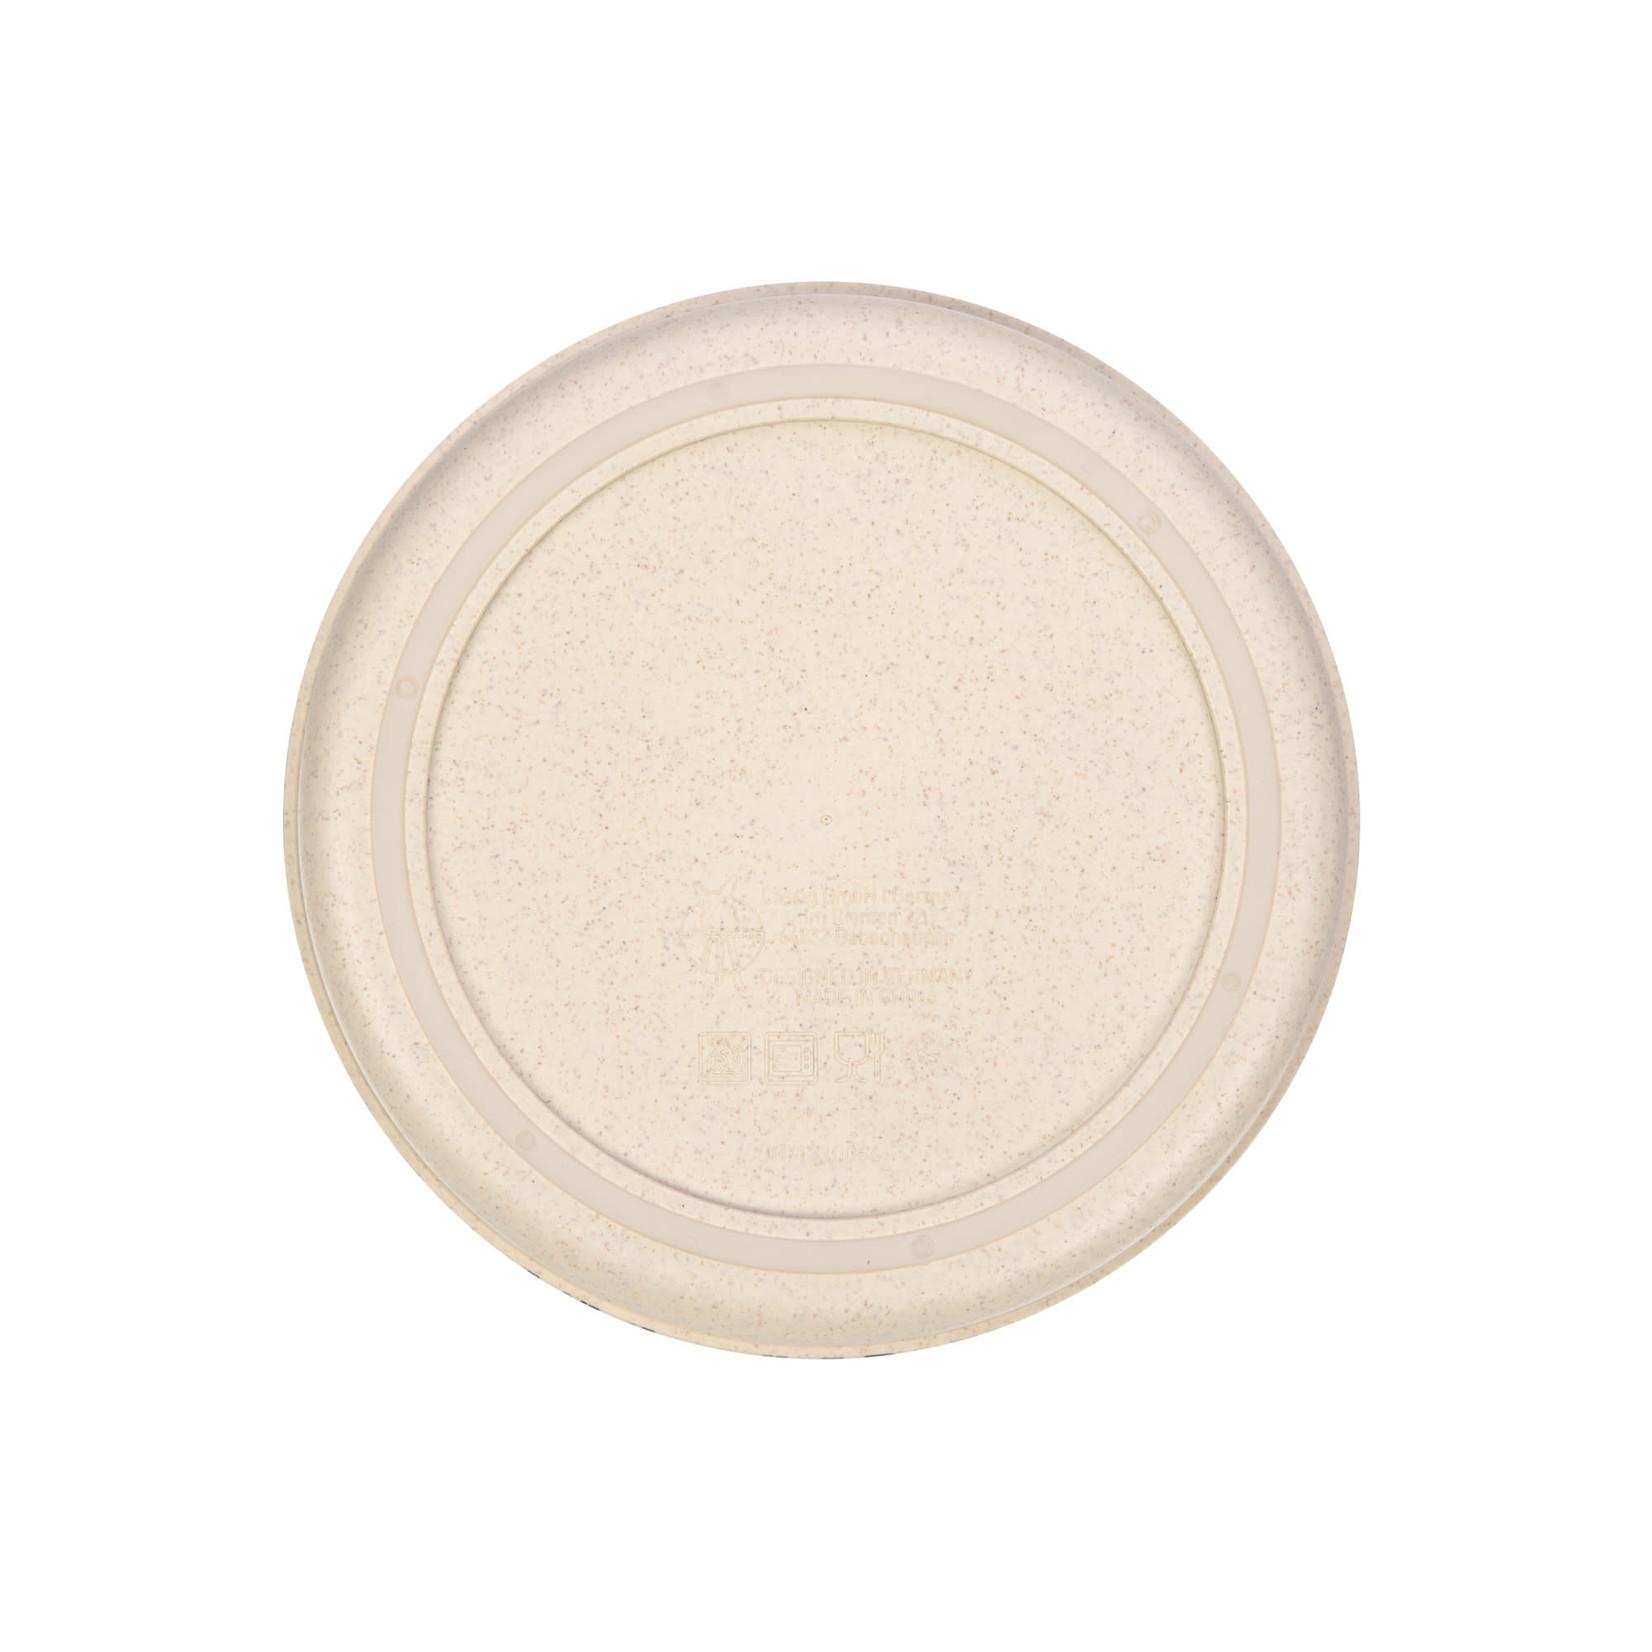 Lässig Bowl PP/Cellulose Tiny Farmer Sheep/Goose Nature